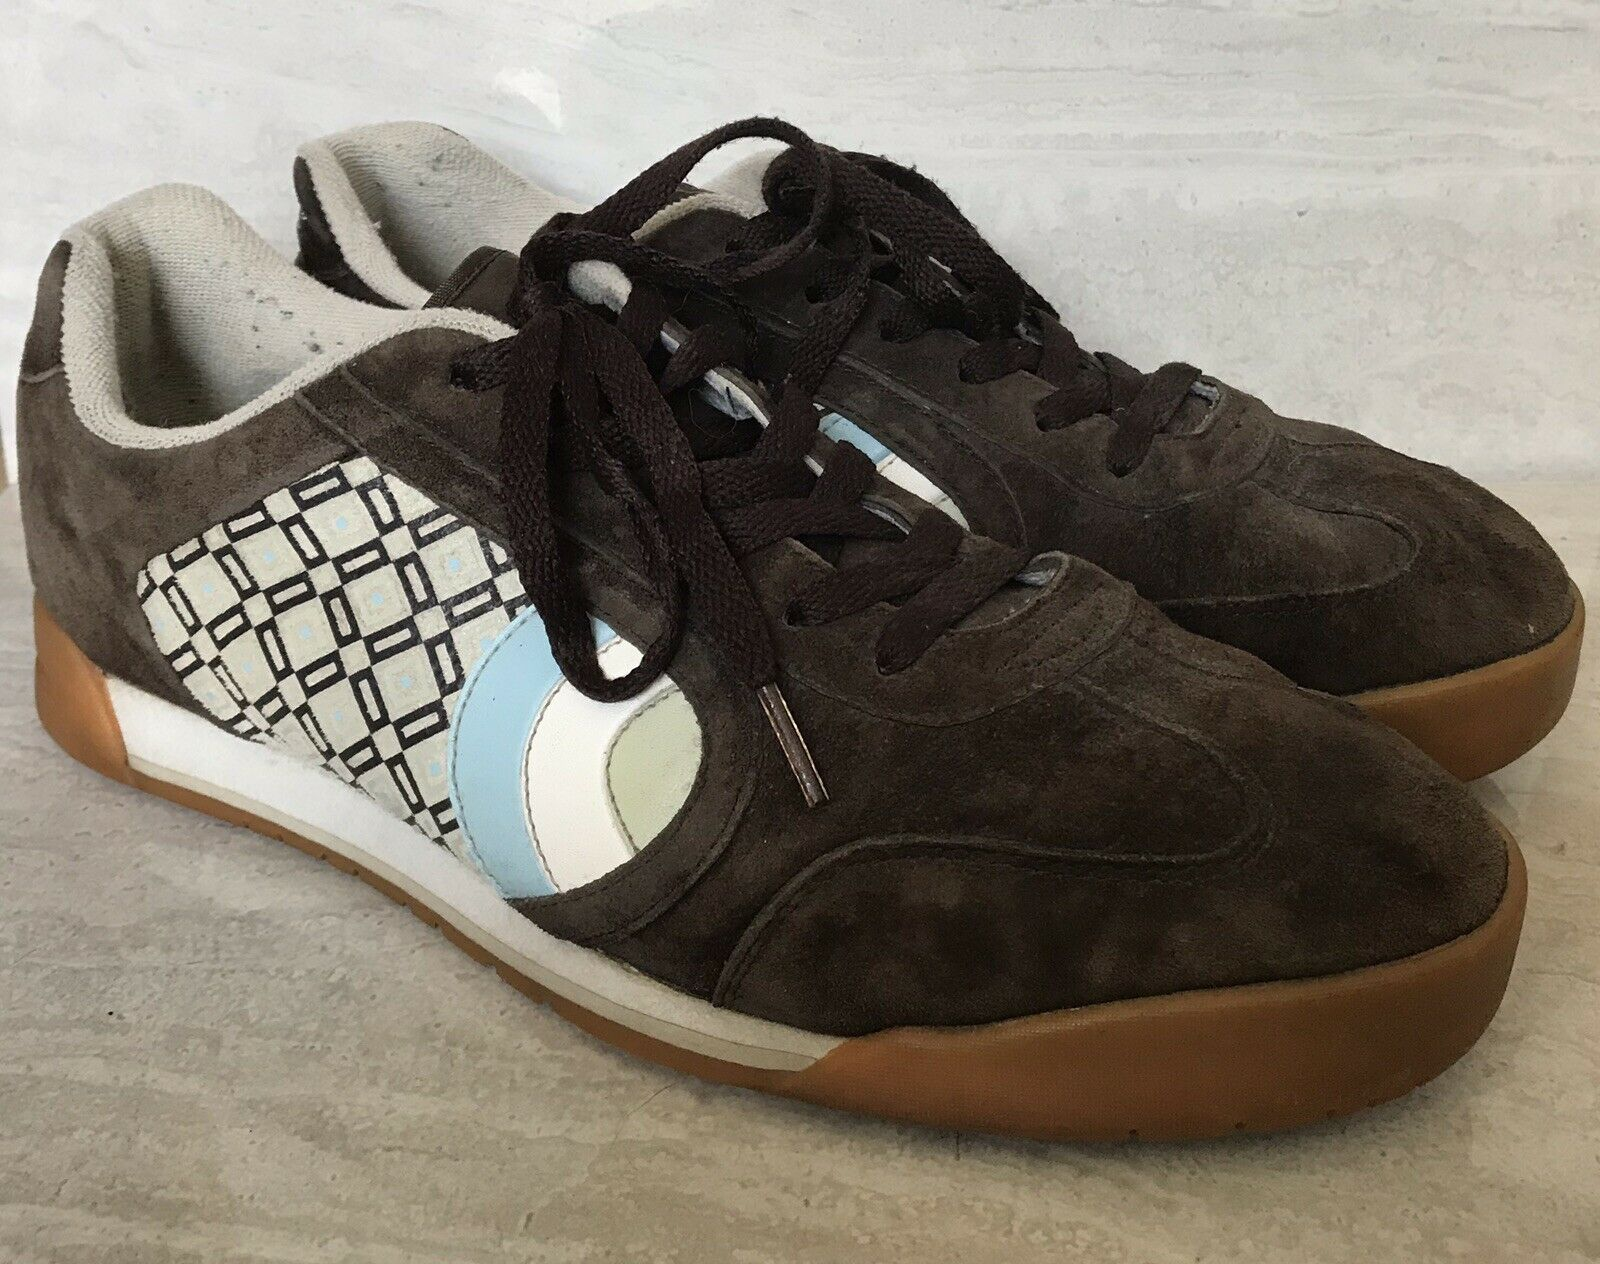 BEN SHERMAN WILDCAT Men's Leather Suede Fashion Vintage Sneakers Brown+  US 11